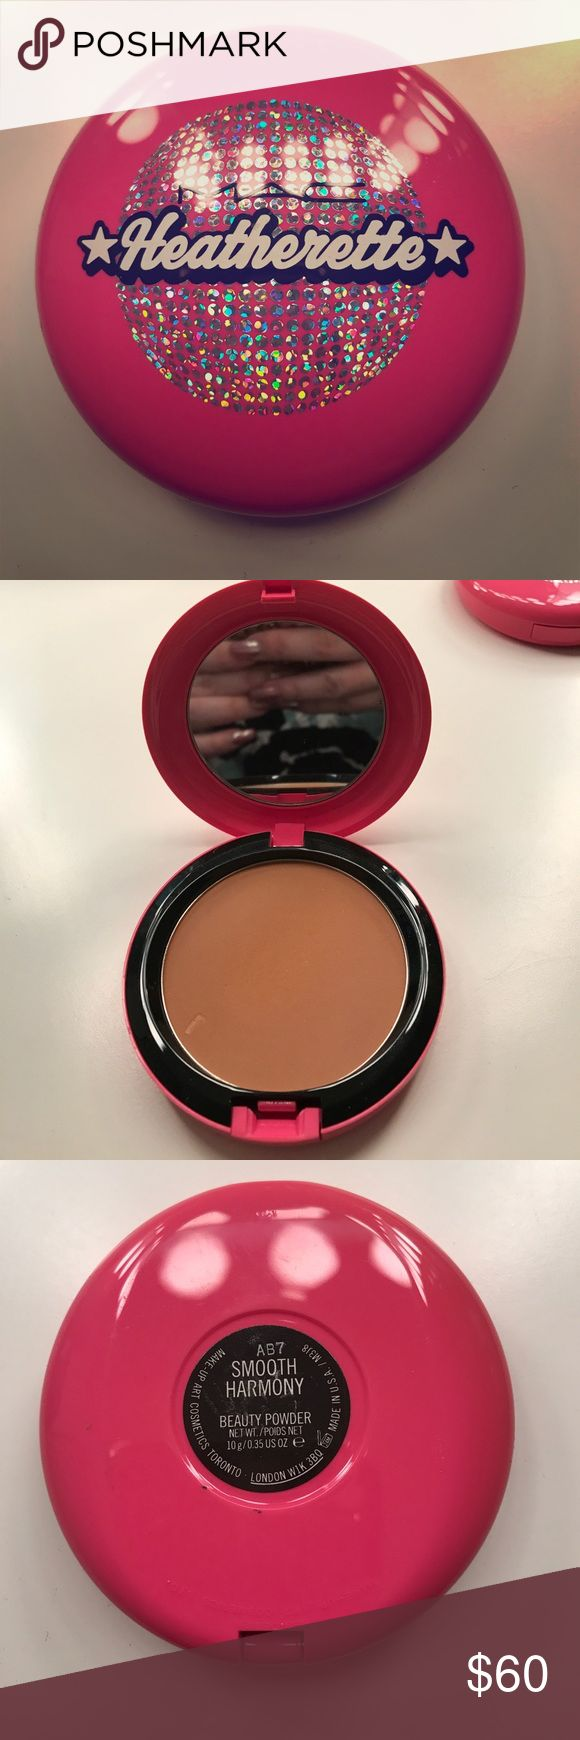 "MAC Heatherette ""Smooth Harmony"" Beauty Powder MAC Heatherette ""Smooth Harmony"" Beauty Powder Limited Edition. No Box MAC Cosmetics Makeup Bronzer"